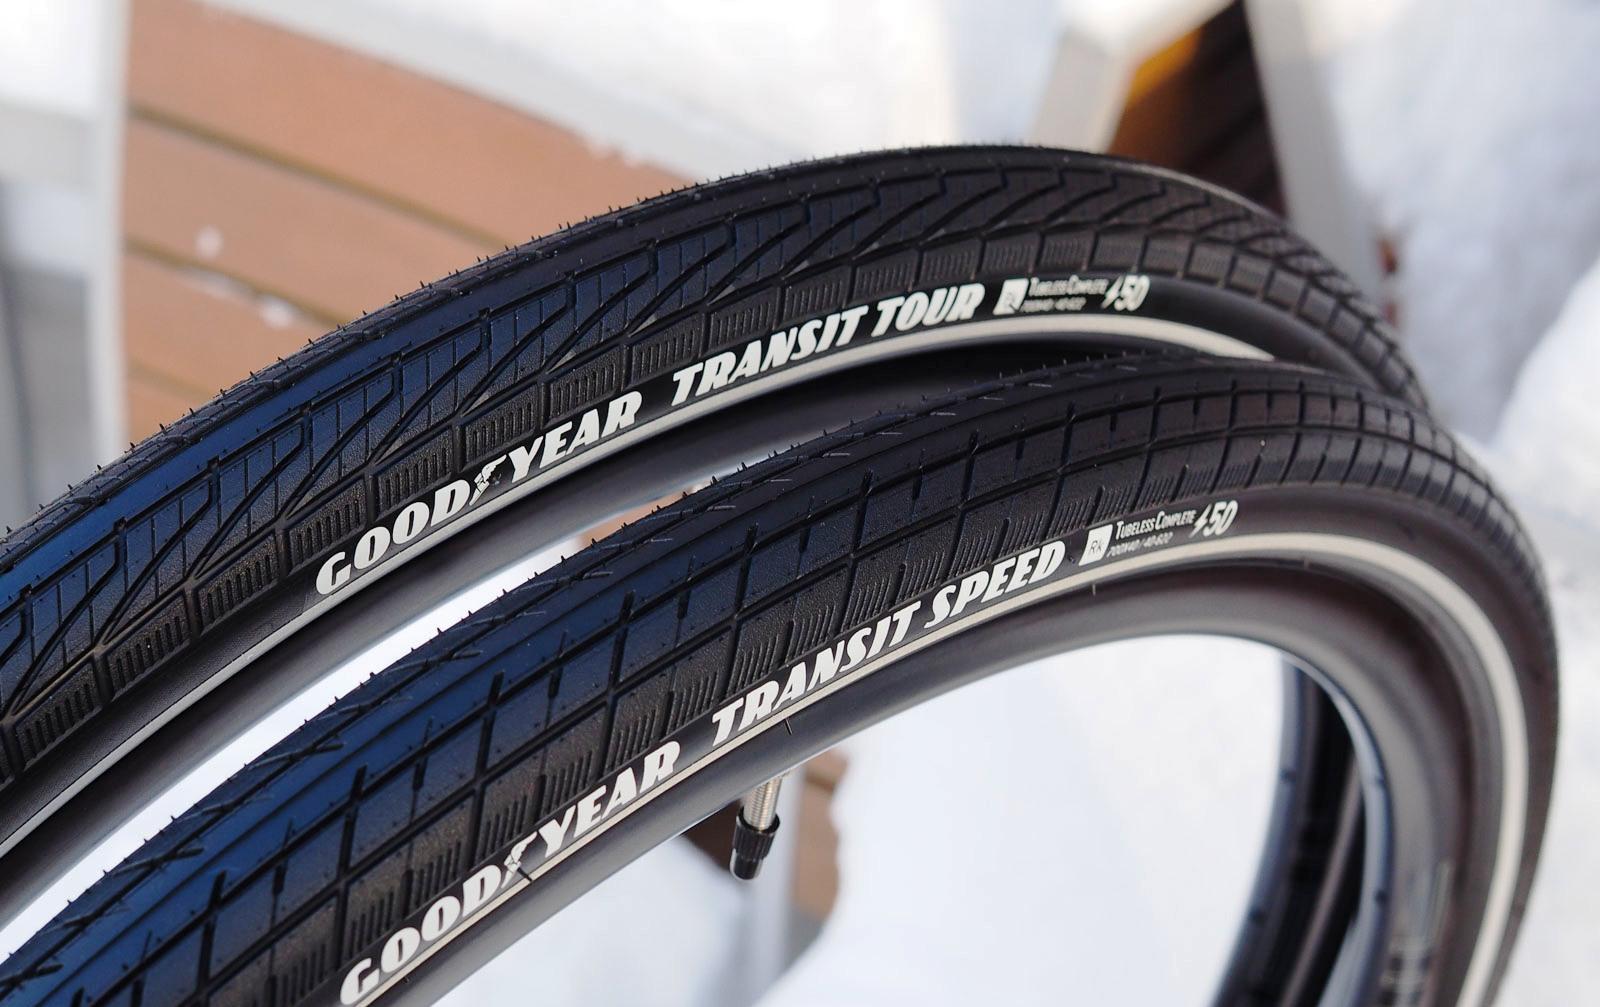 Goodyear – Με μια μεγάλη γκάμα από ποδηλατικά ελαστικά!